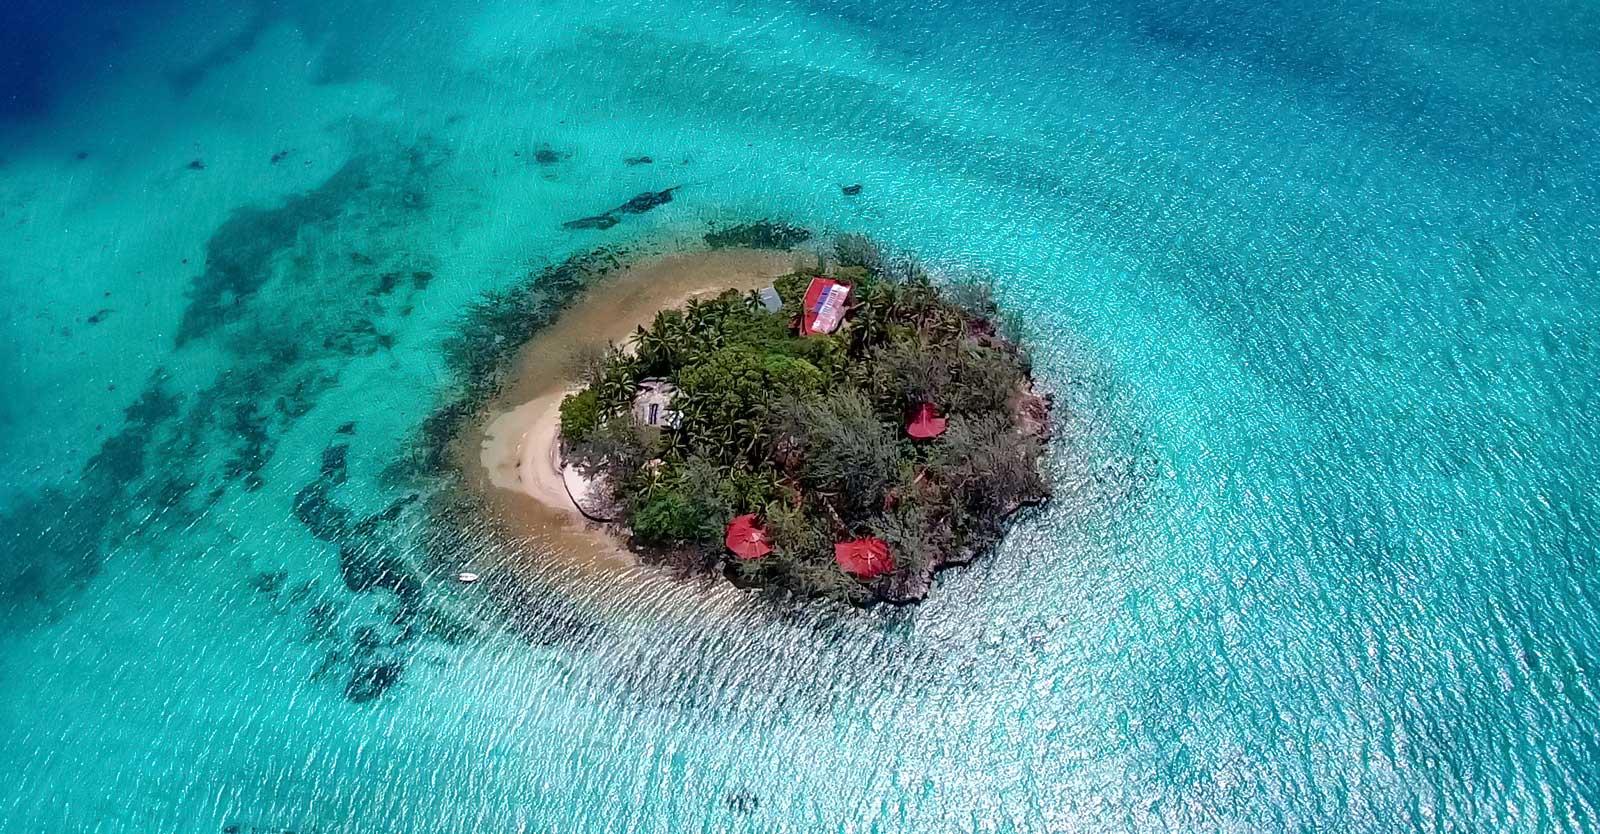 Tonga, Vava'u Group